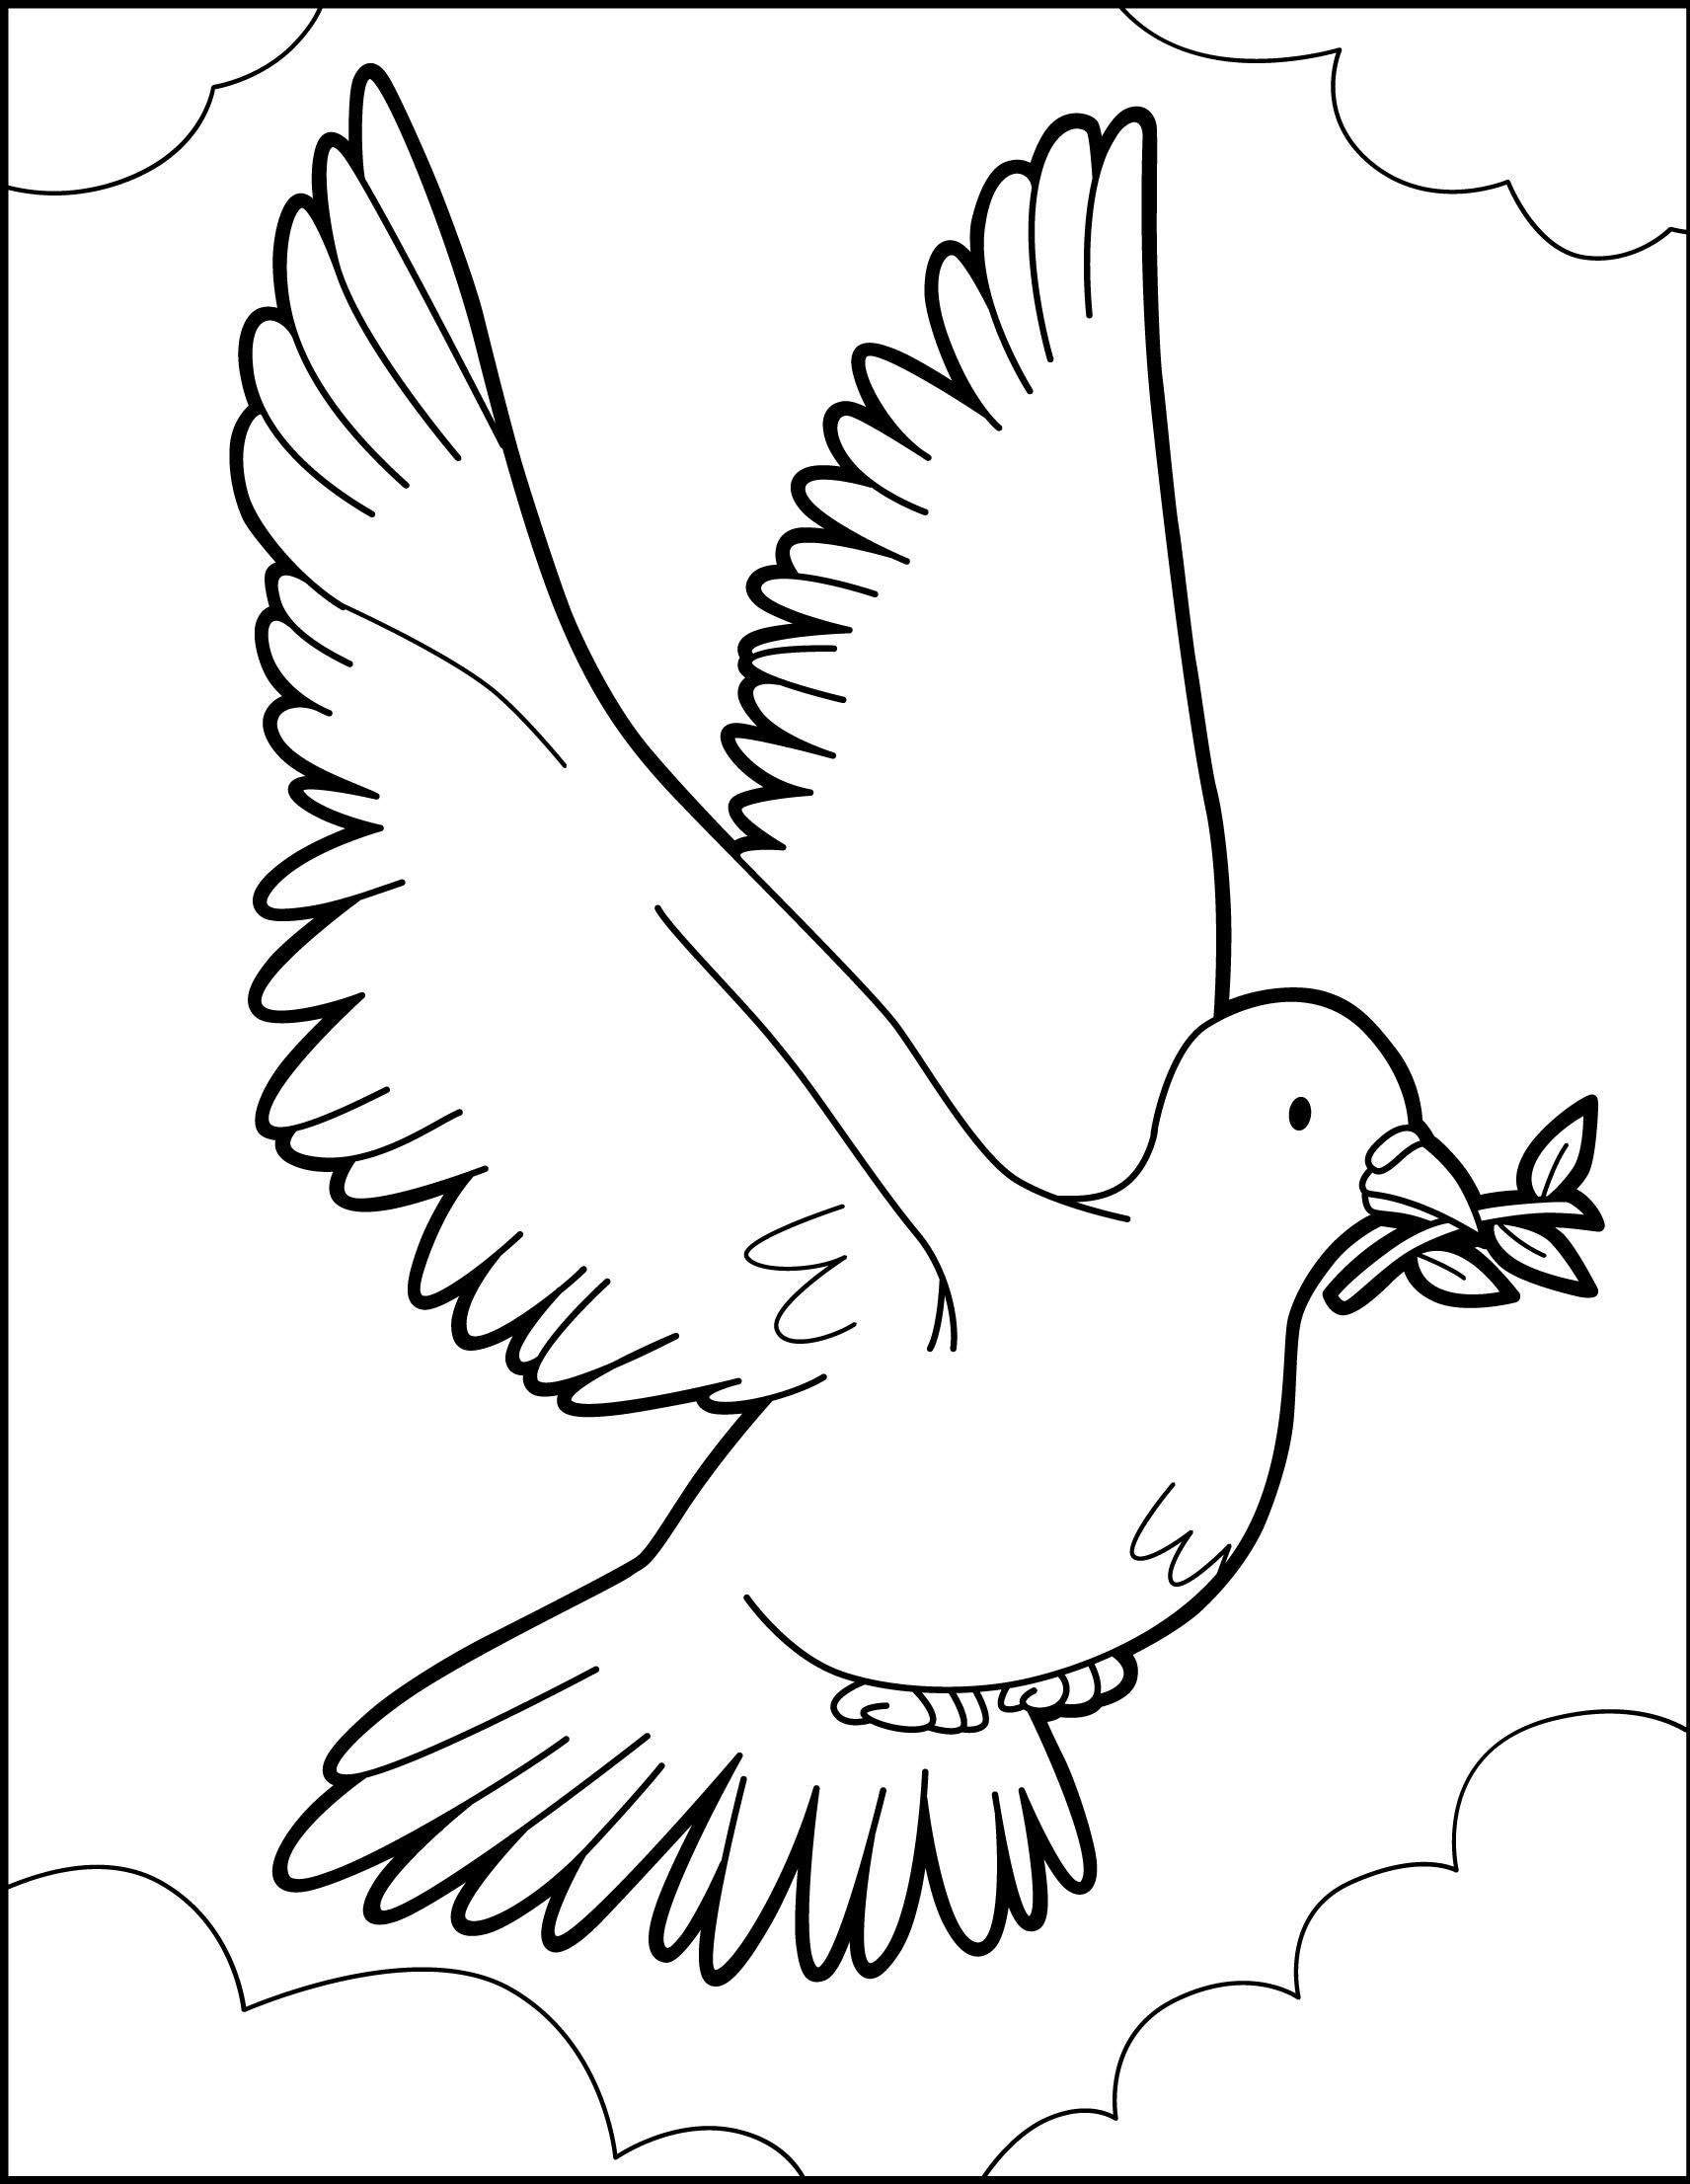 Dibujo Paloma De La Paz Para Imprimir Imagui